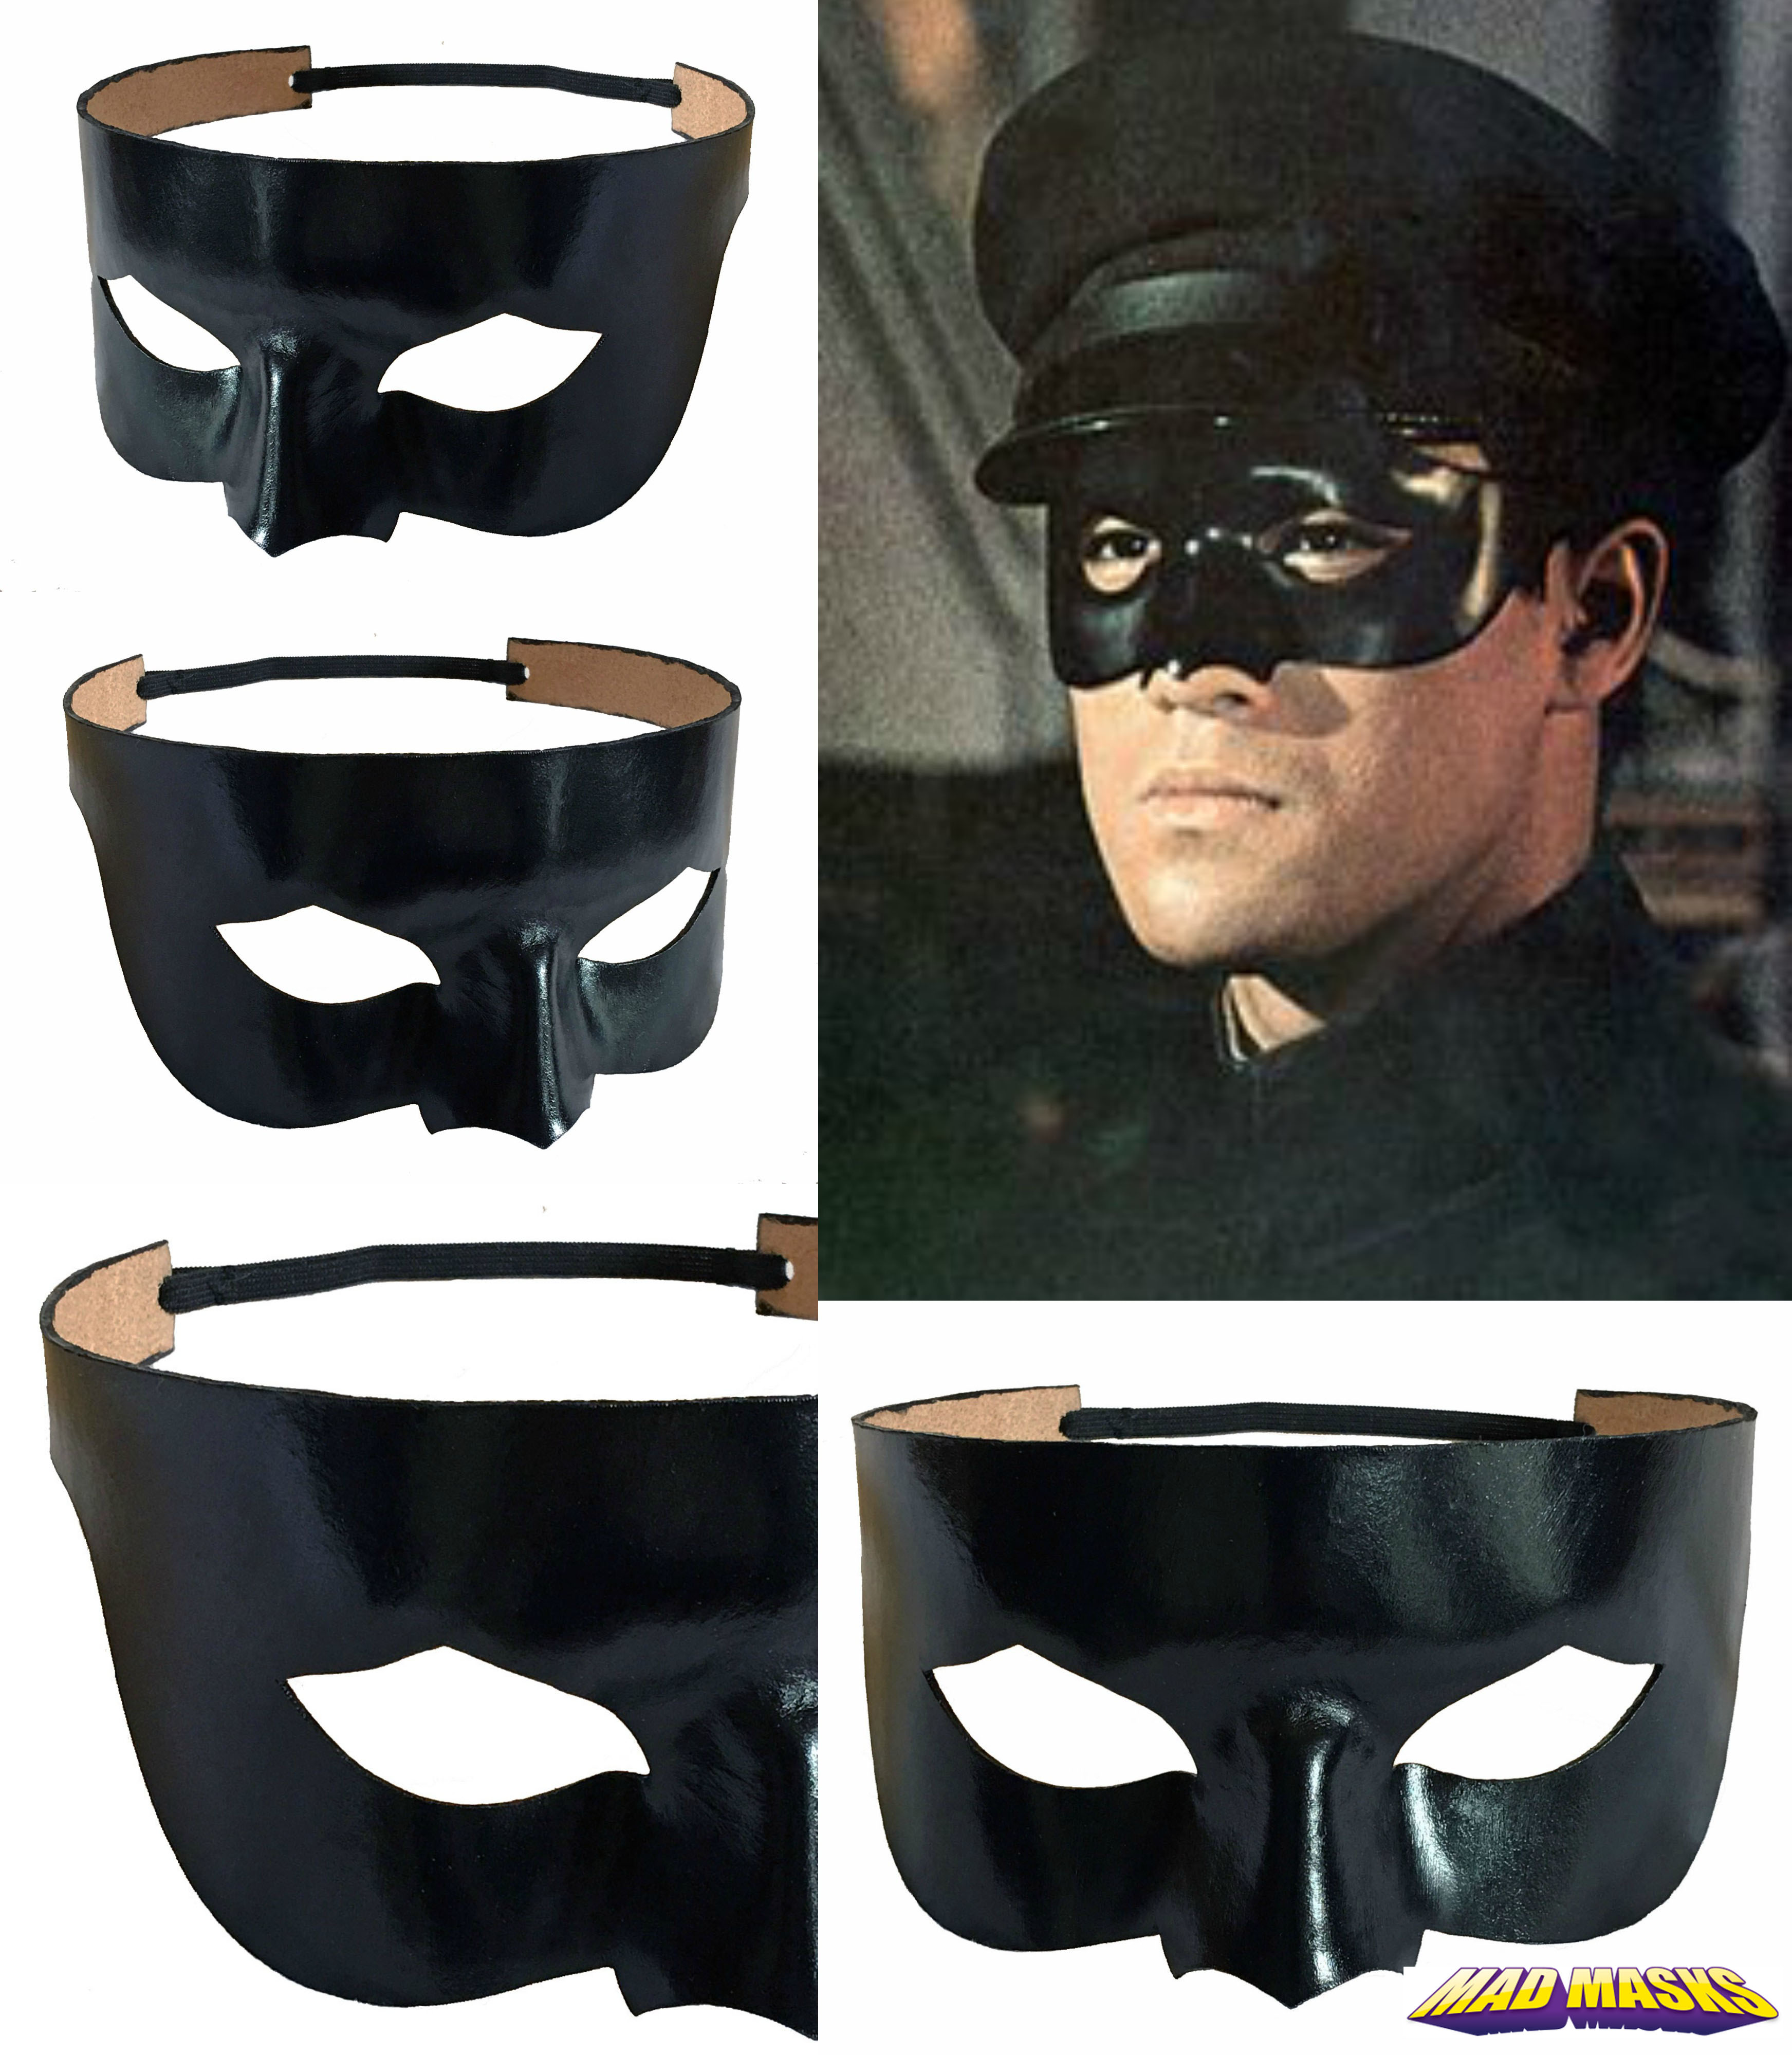 kato-mask-collage-3.jpg